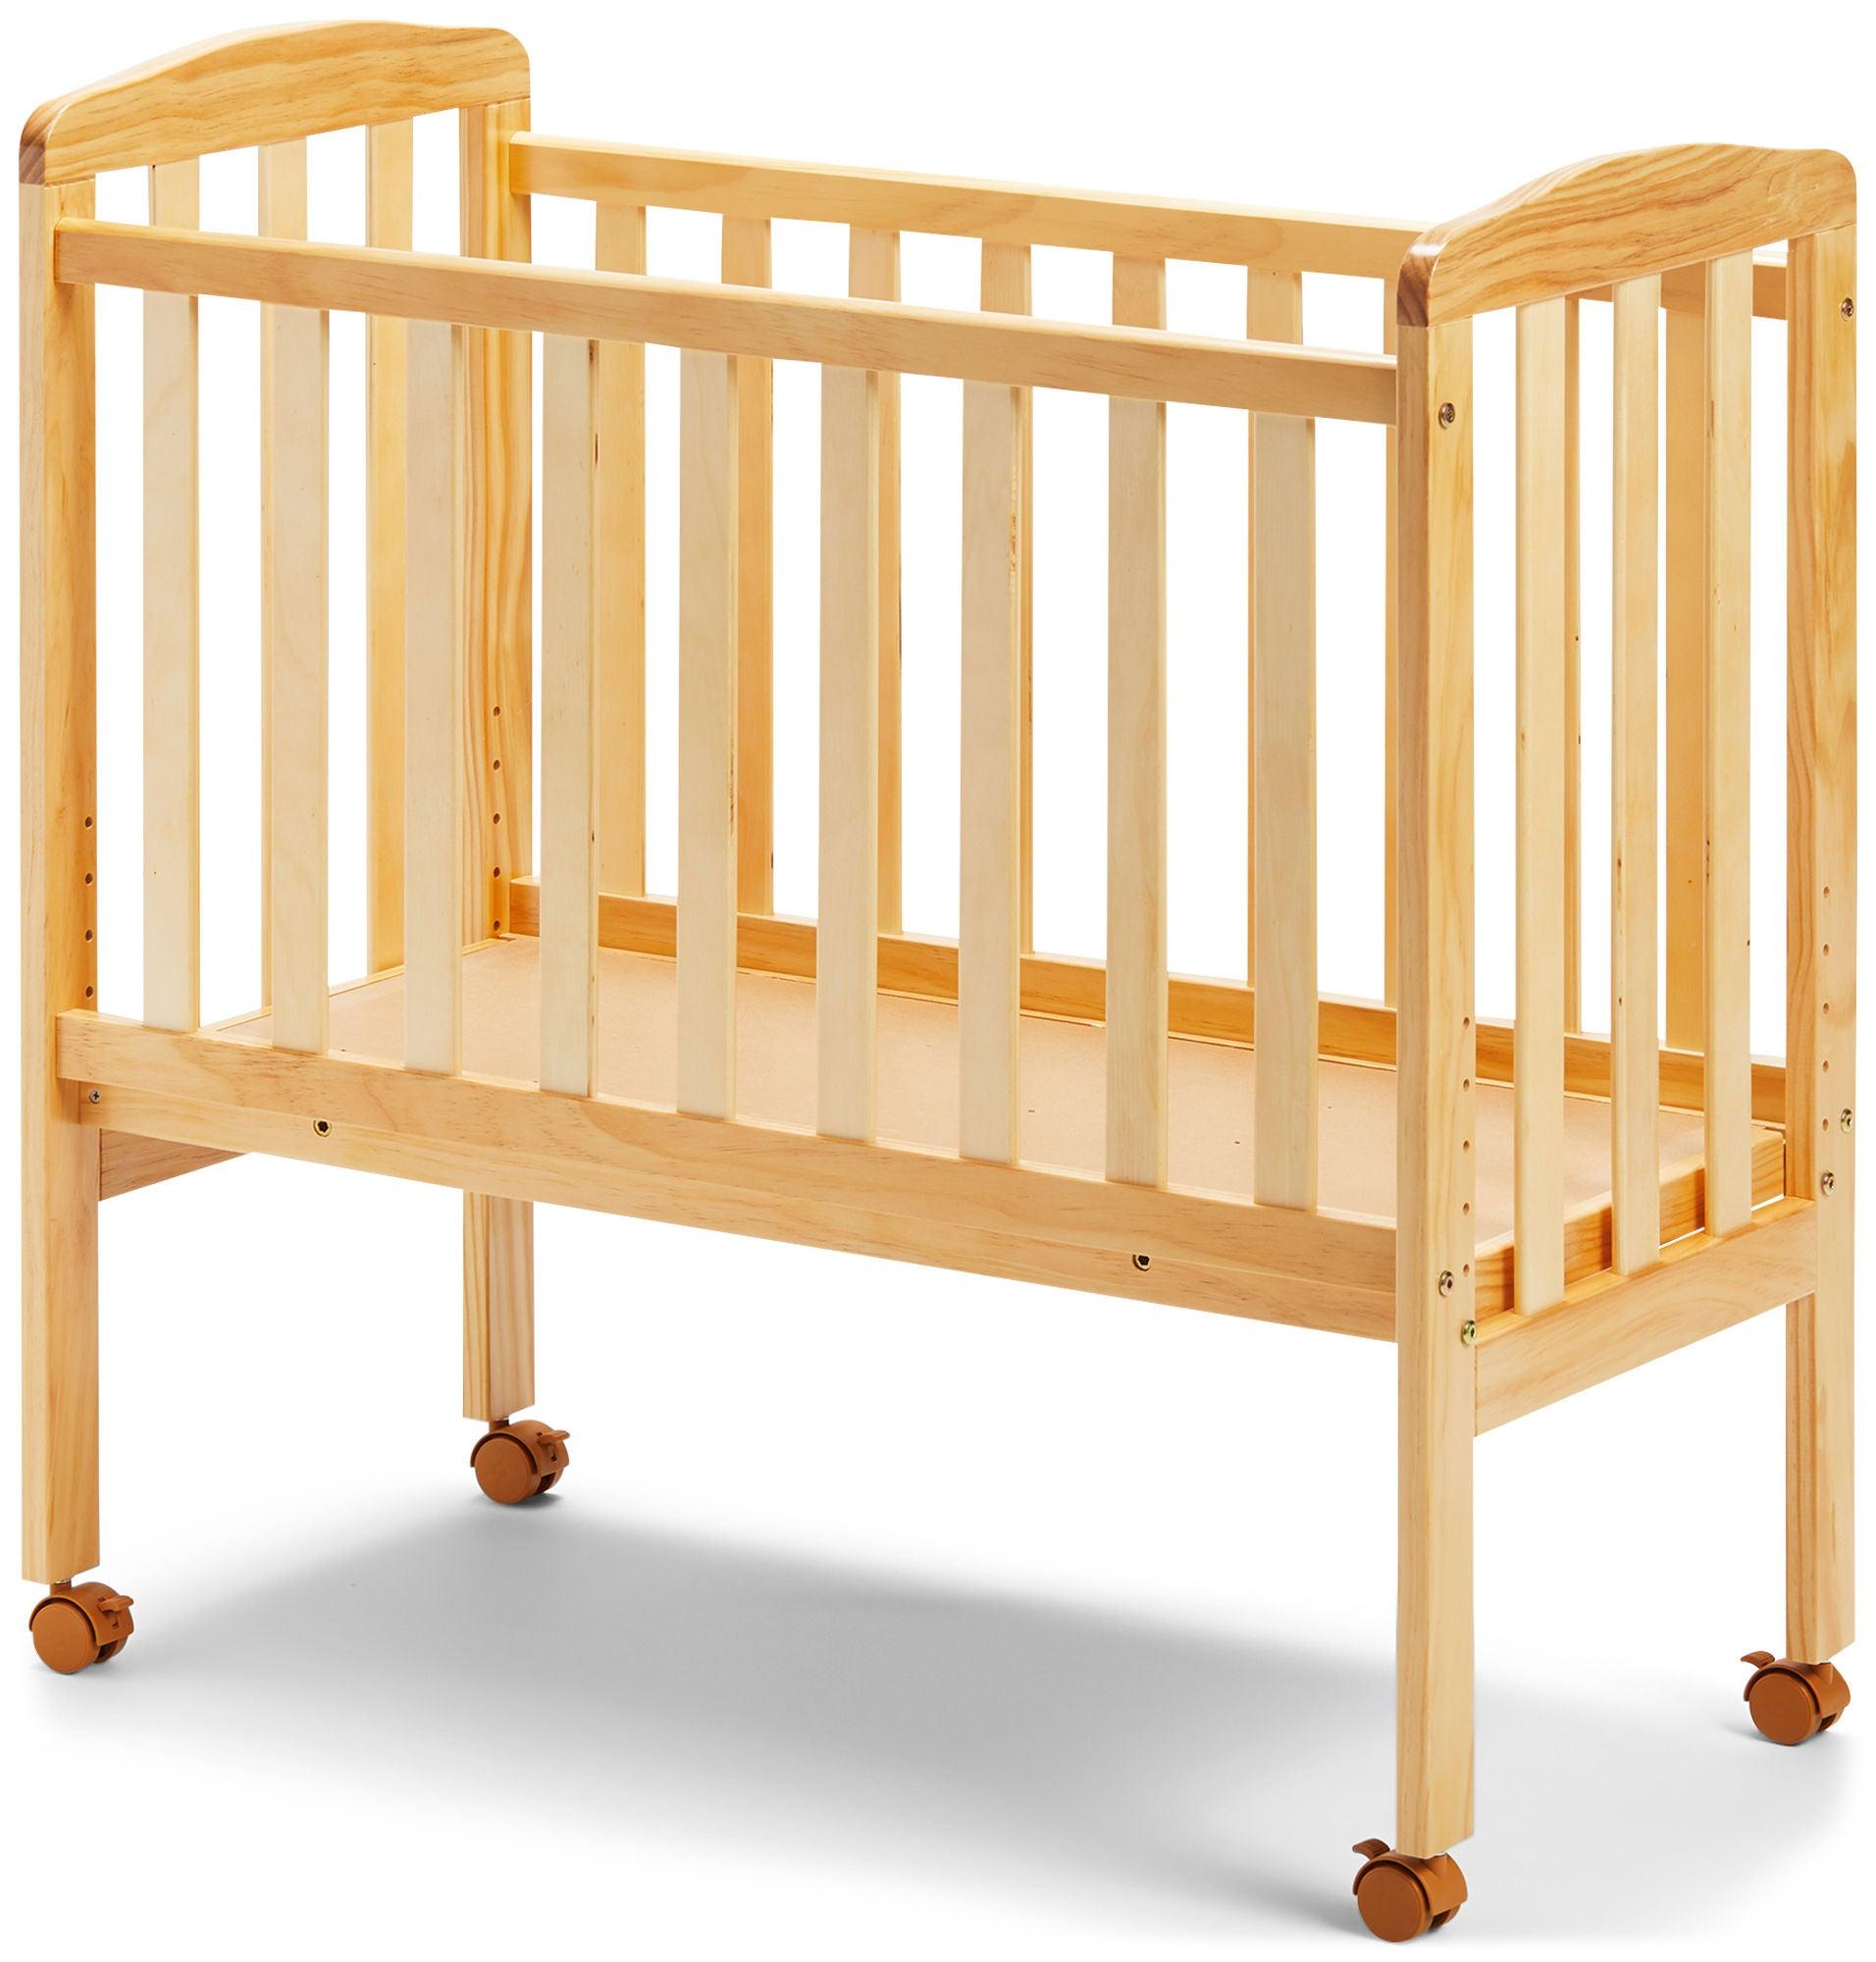 JLY Dream Bedside Crib, Natural